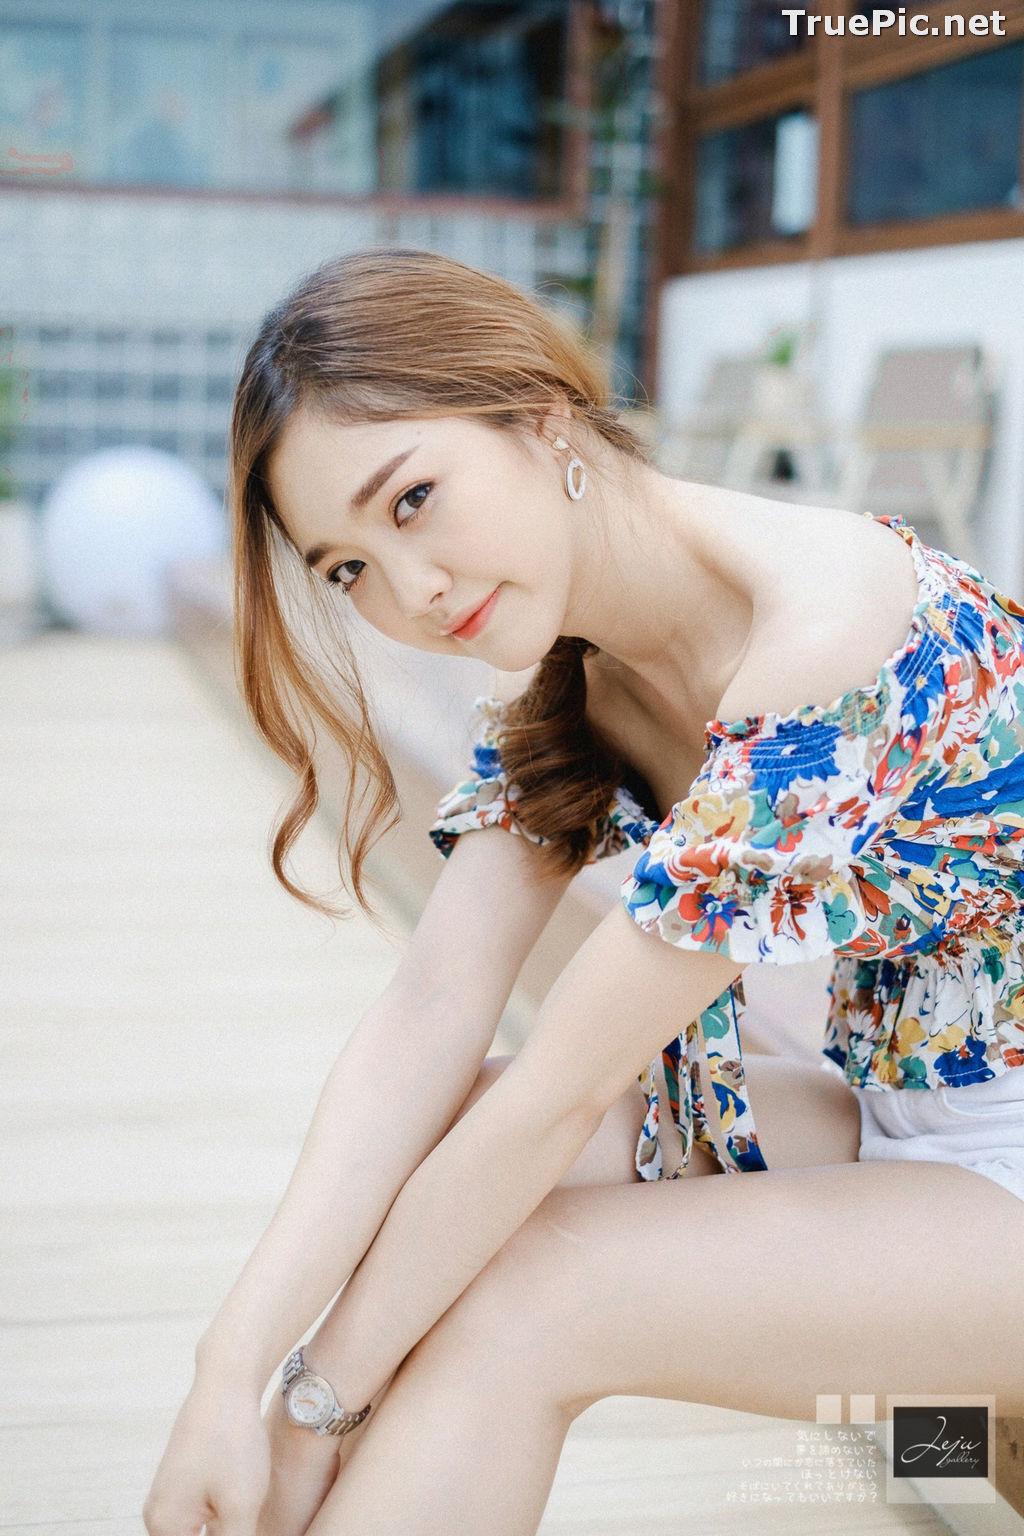 Image Thailand Beautiful Model - Viva Pongdechkajorn - Tetta Viva - TruePic.net - Picture-4